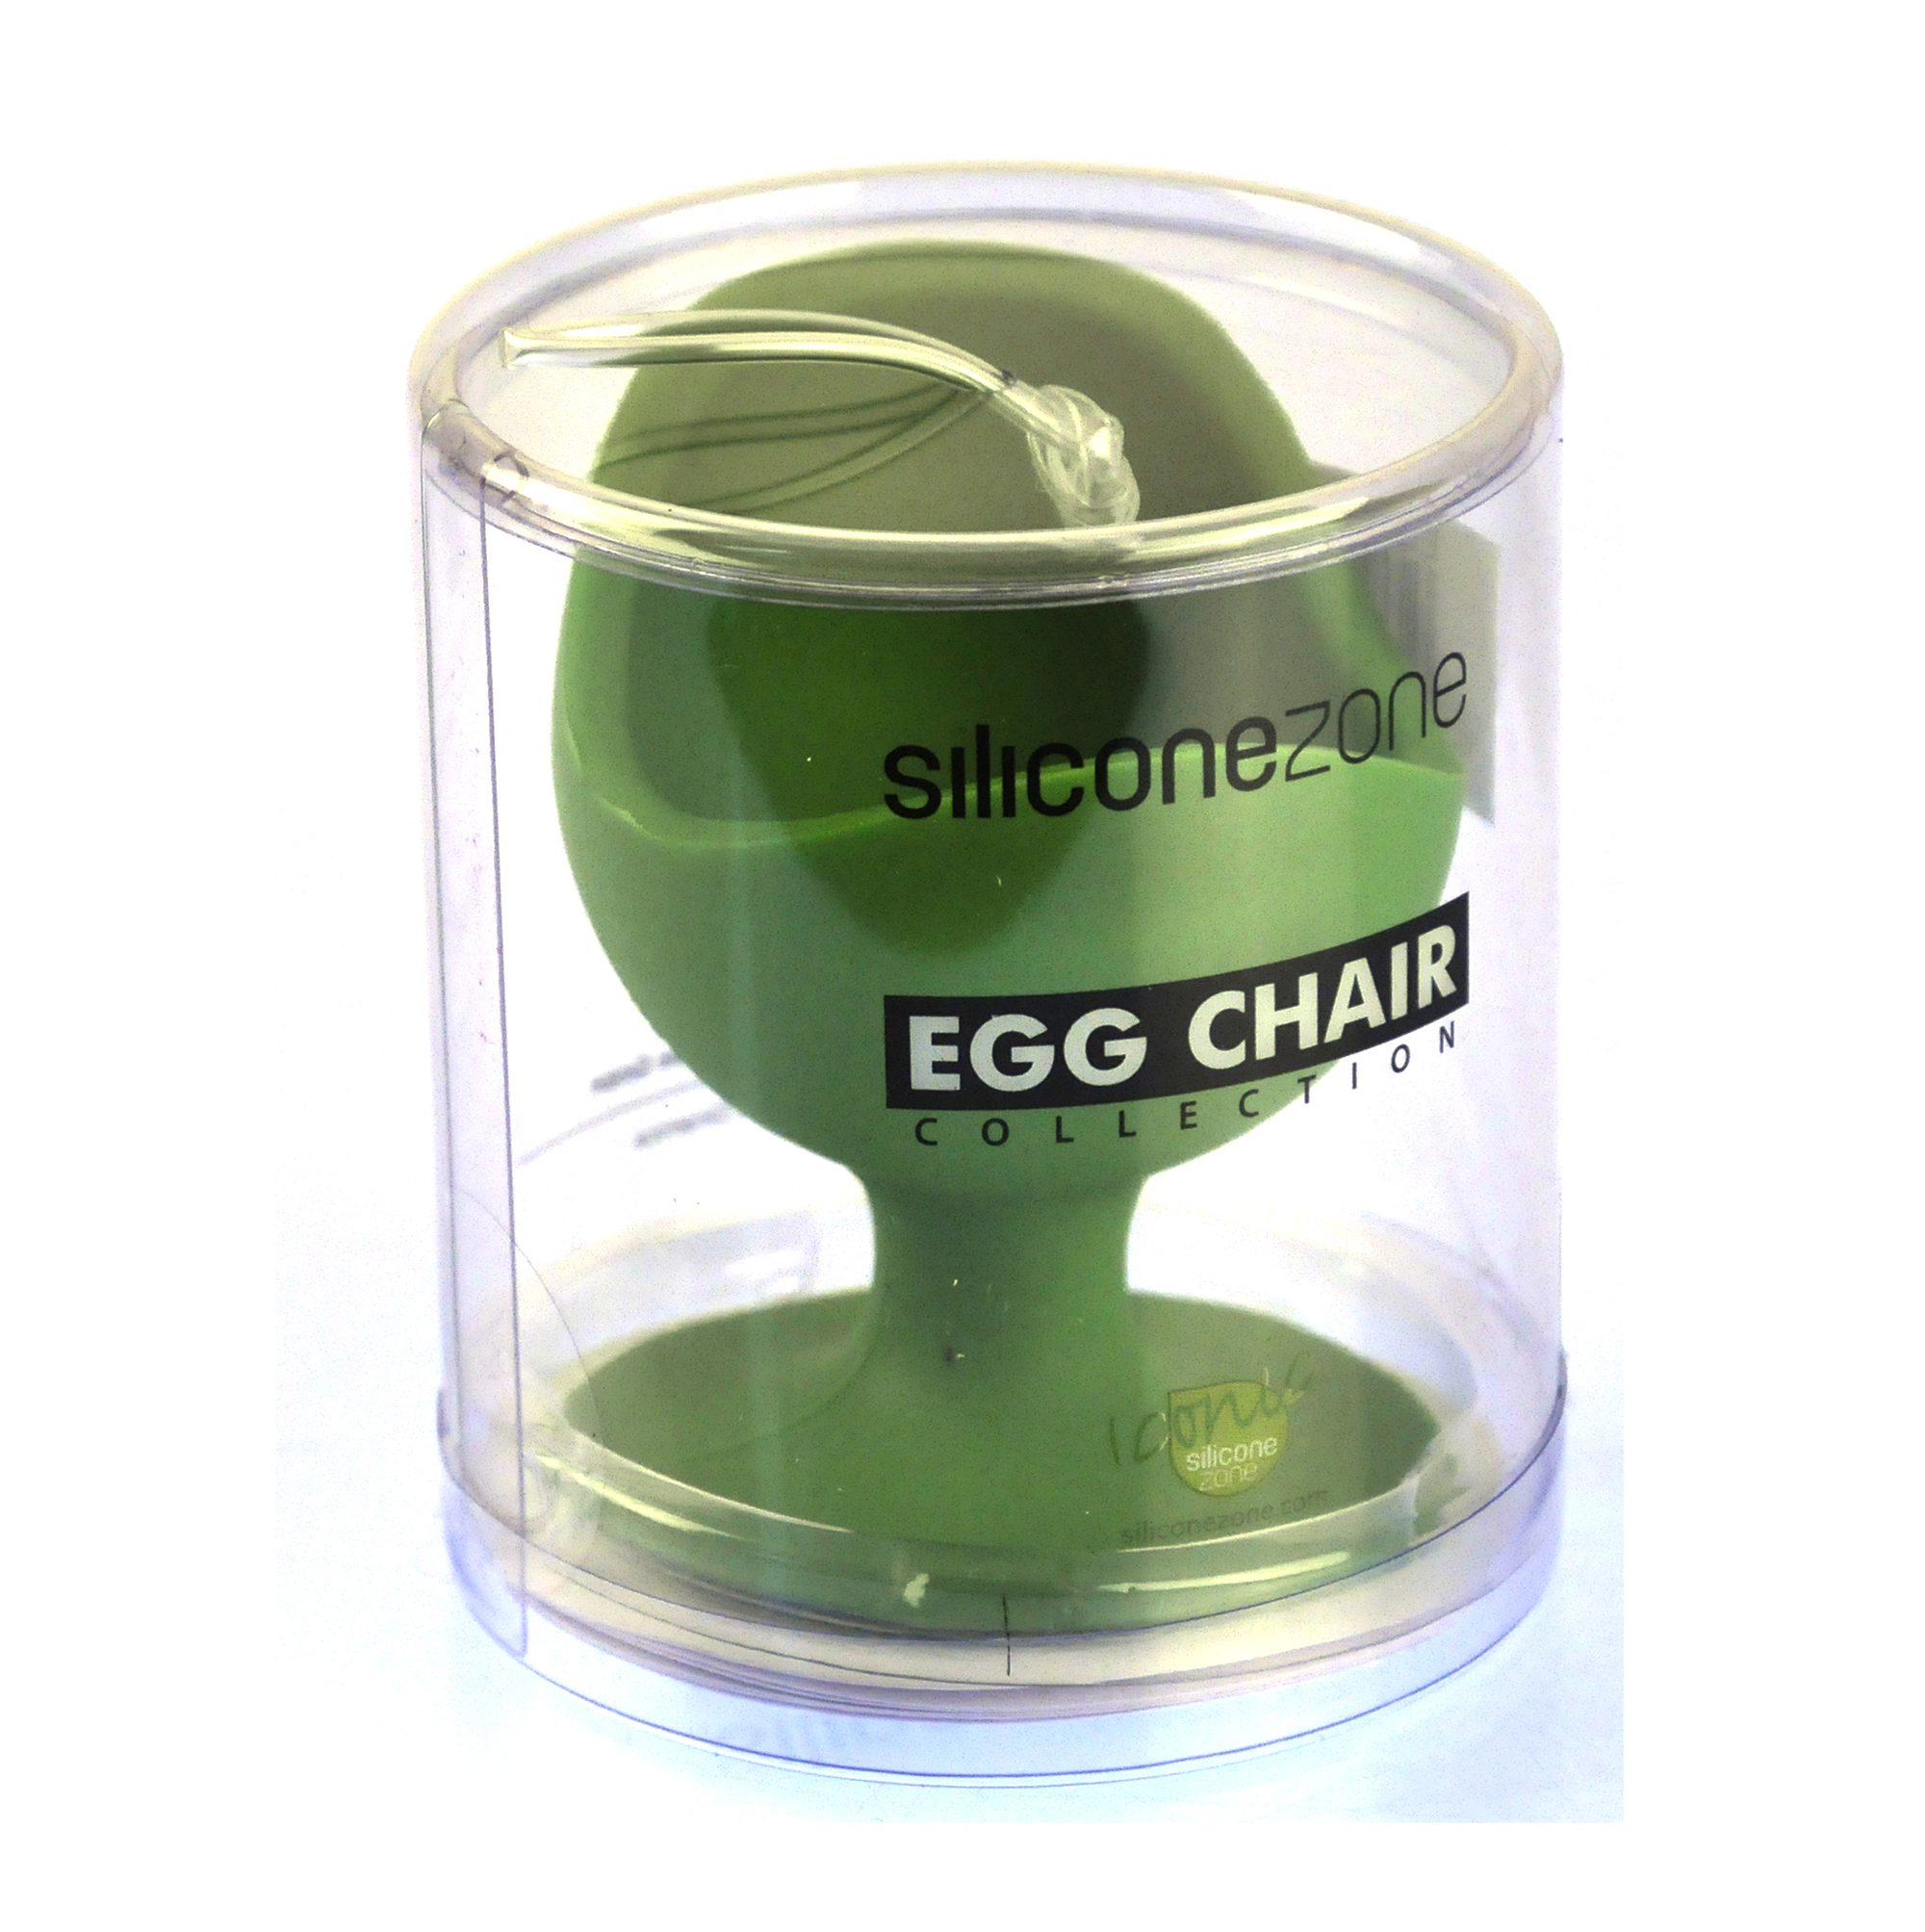 gr n ei stuhl silikon zone sammlung eierbecher ebay. Black Bedroom Furniture Sets. Home Design Ideas